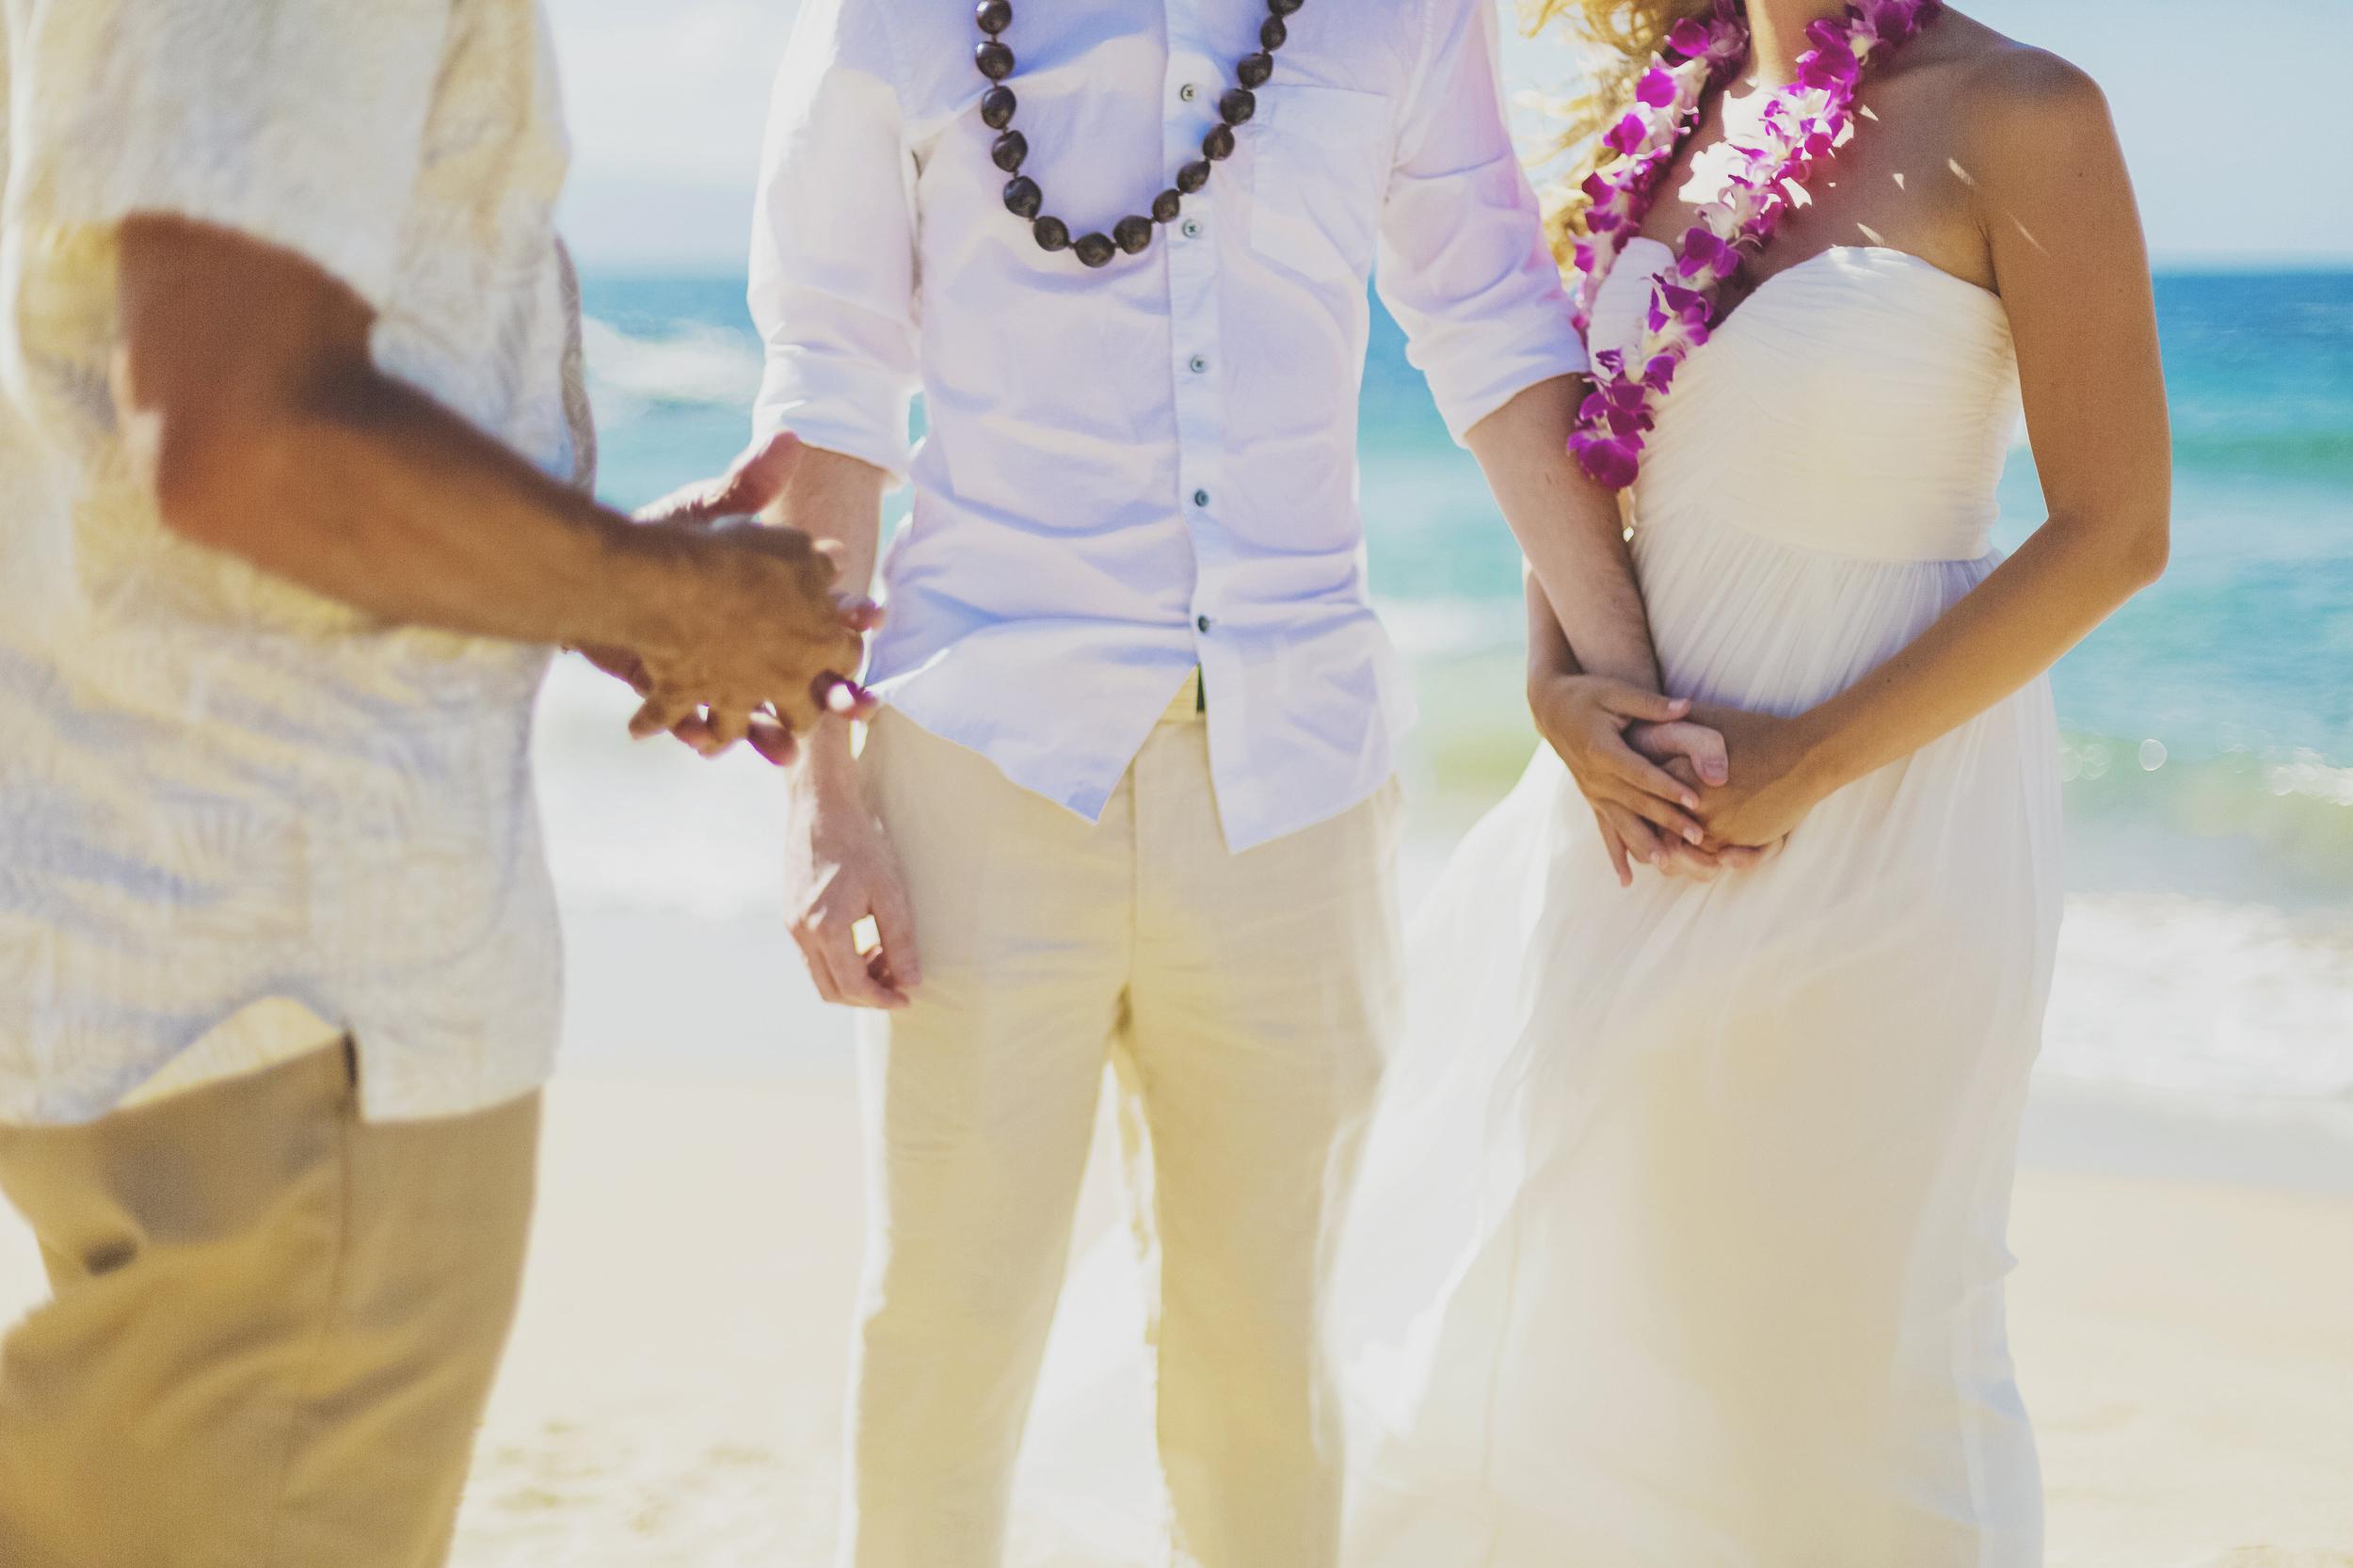 angie-diaz-photography-maui-honeymoon-hawaii-elopement-4.jpg